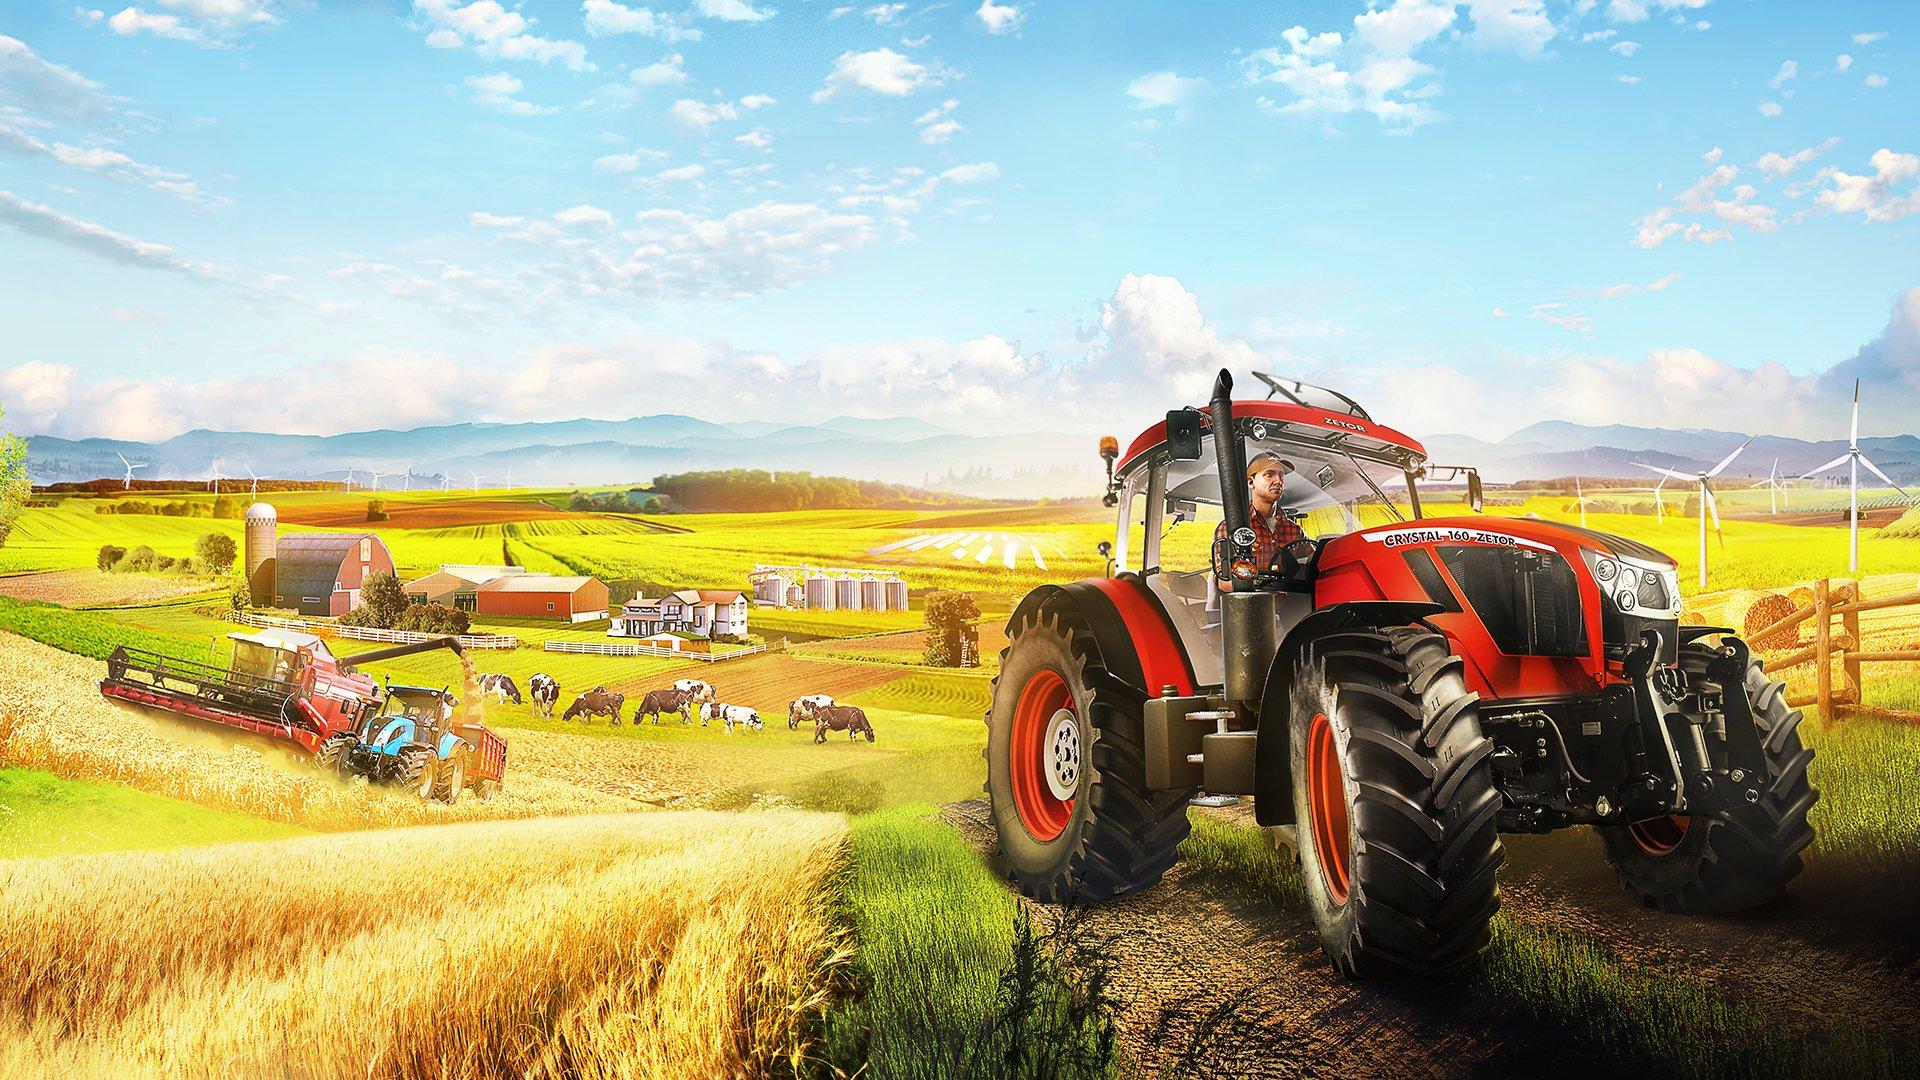 Pure Farming 2018 HD Wallpaper Background Image 1920x1080 ID 1920x1080